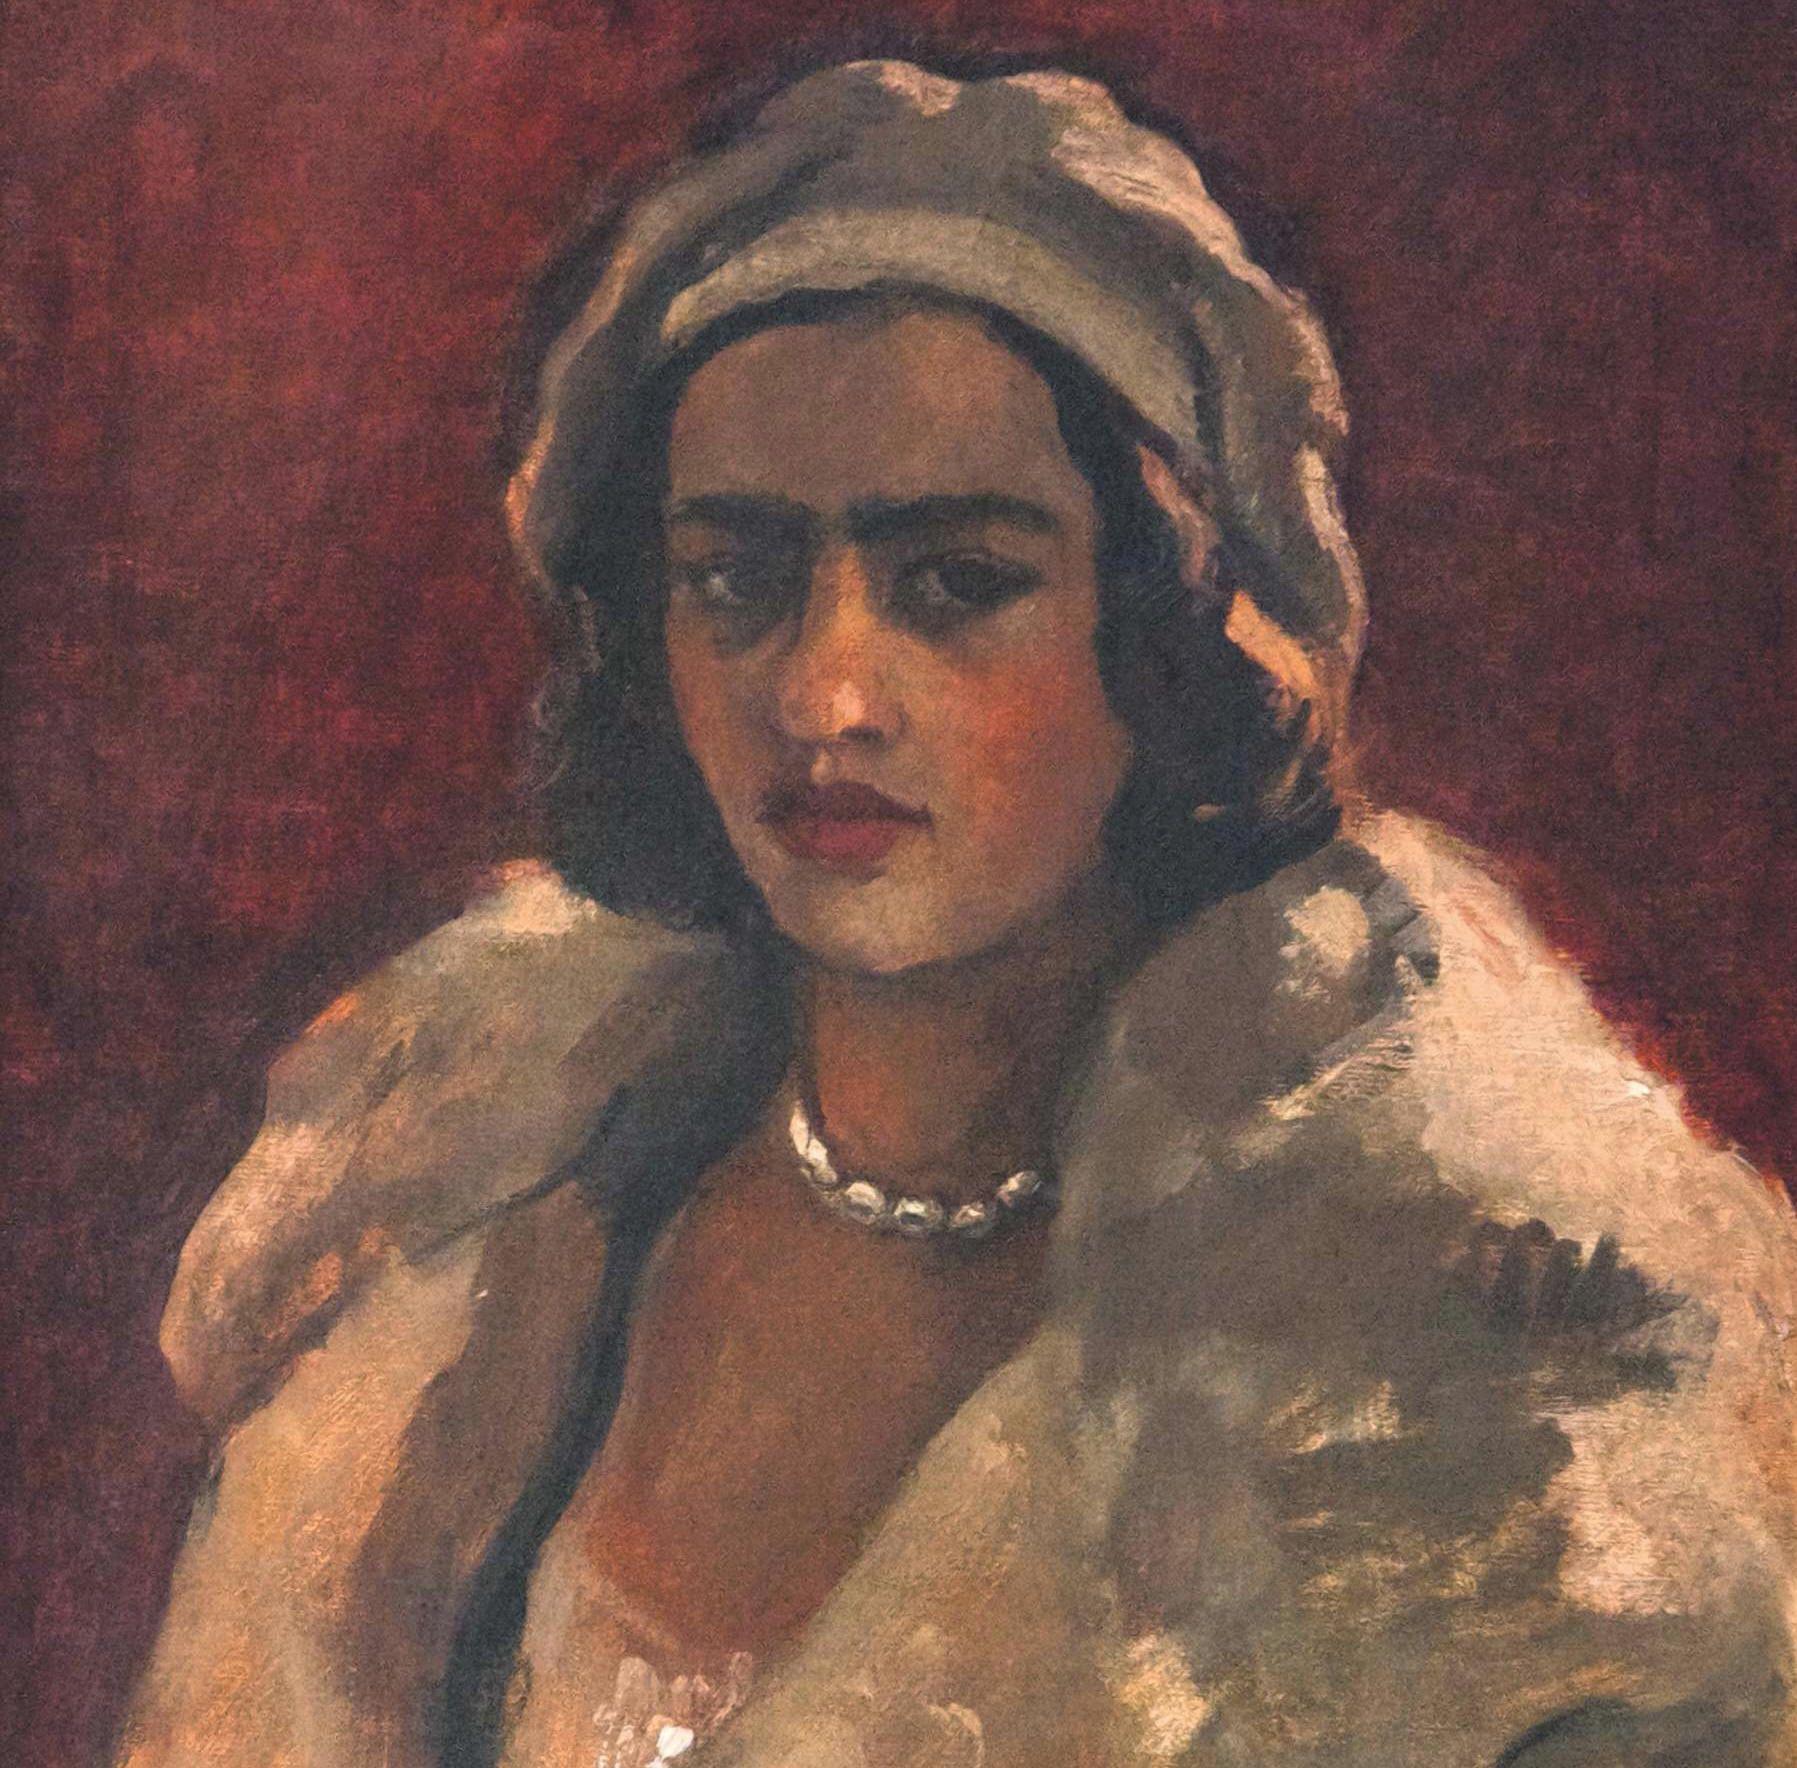 adef0ff86834 amrita shergill famous paintings - Google Search | The Art of Amrita ...